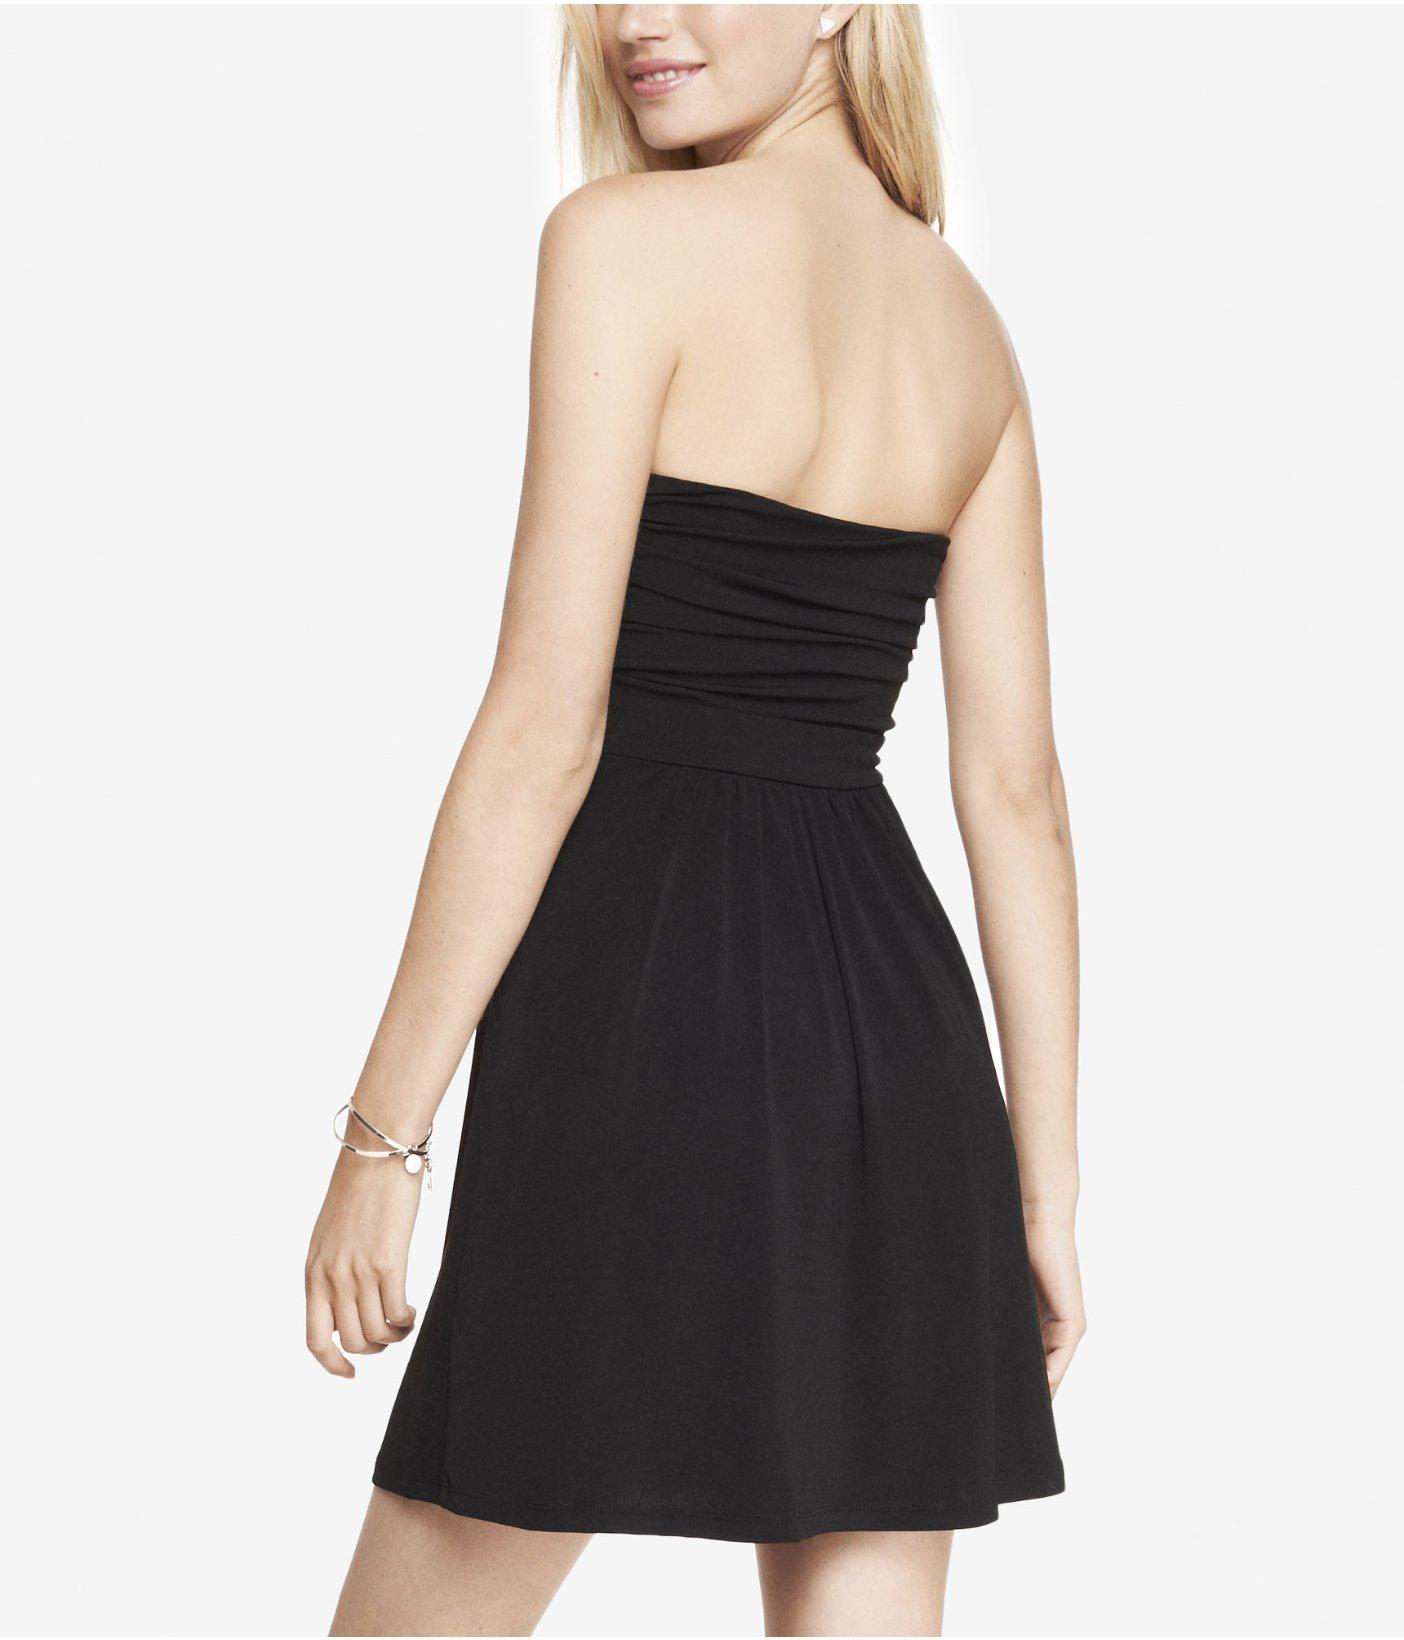 Strapless Ruched Black Mini Dress